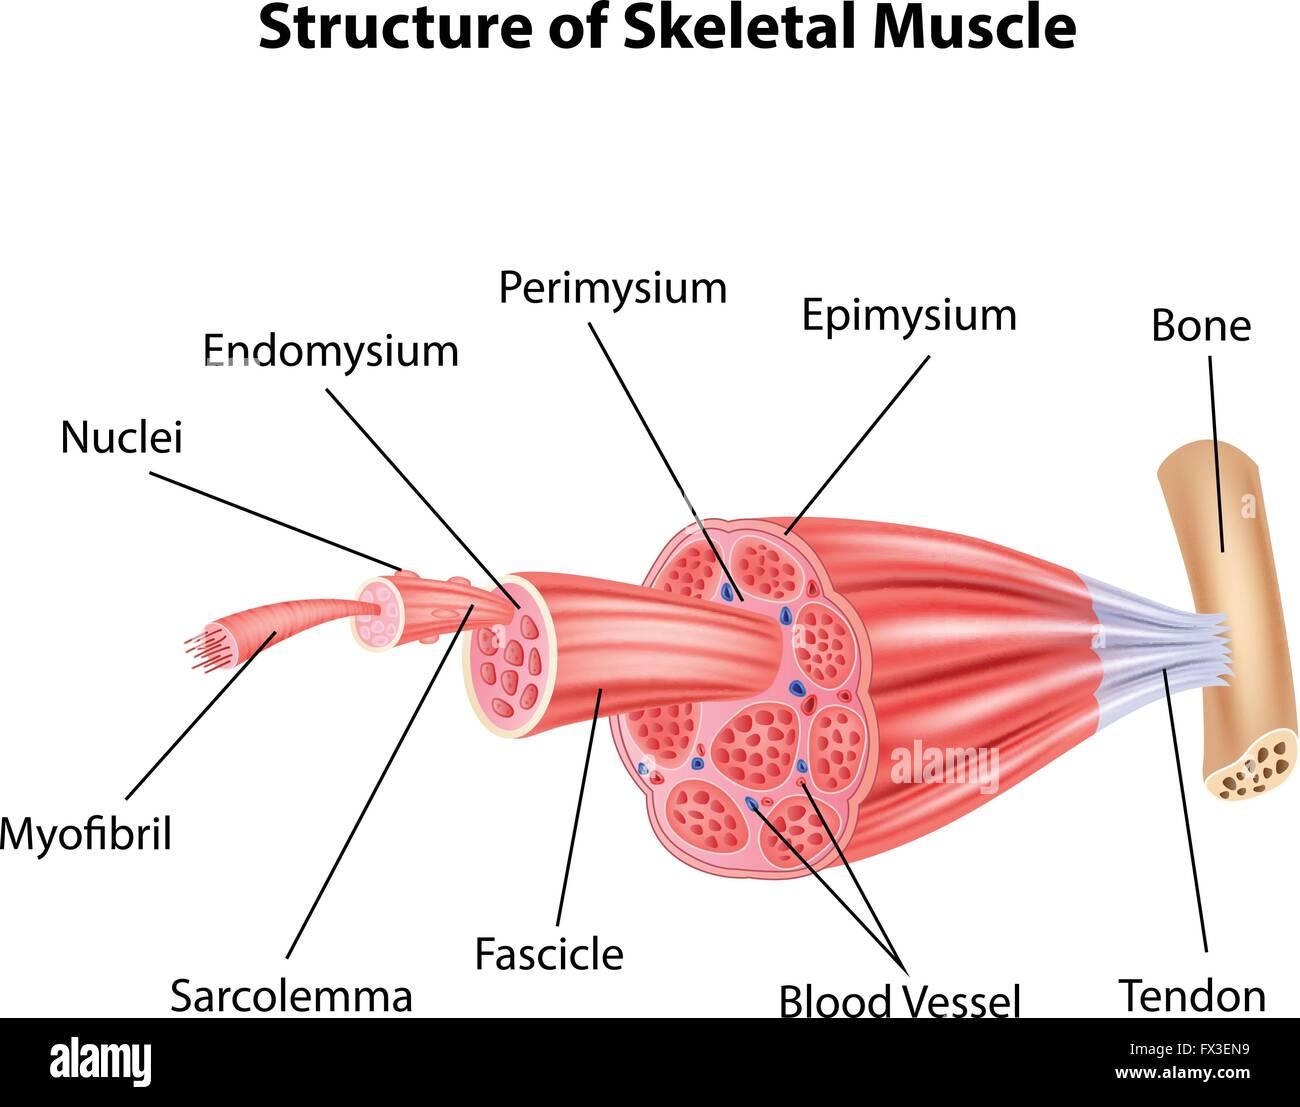 Skeletal Muscle Fiber Stockfotos & Skeletal Muscle Fiber Bilder - Alamy